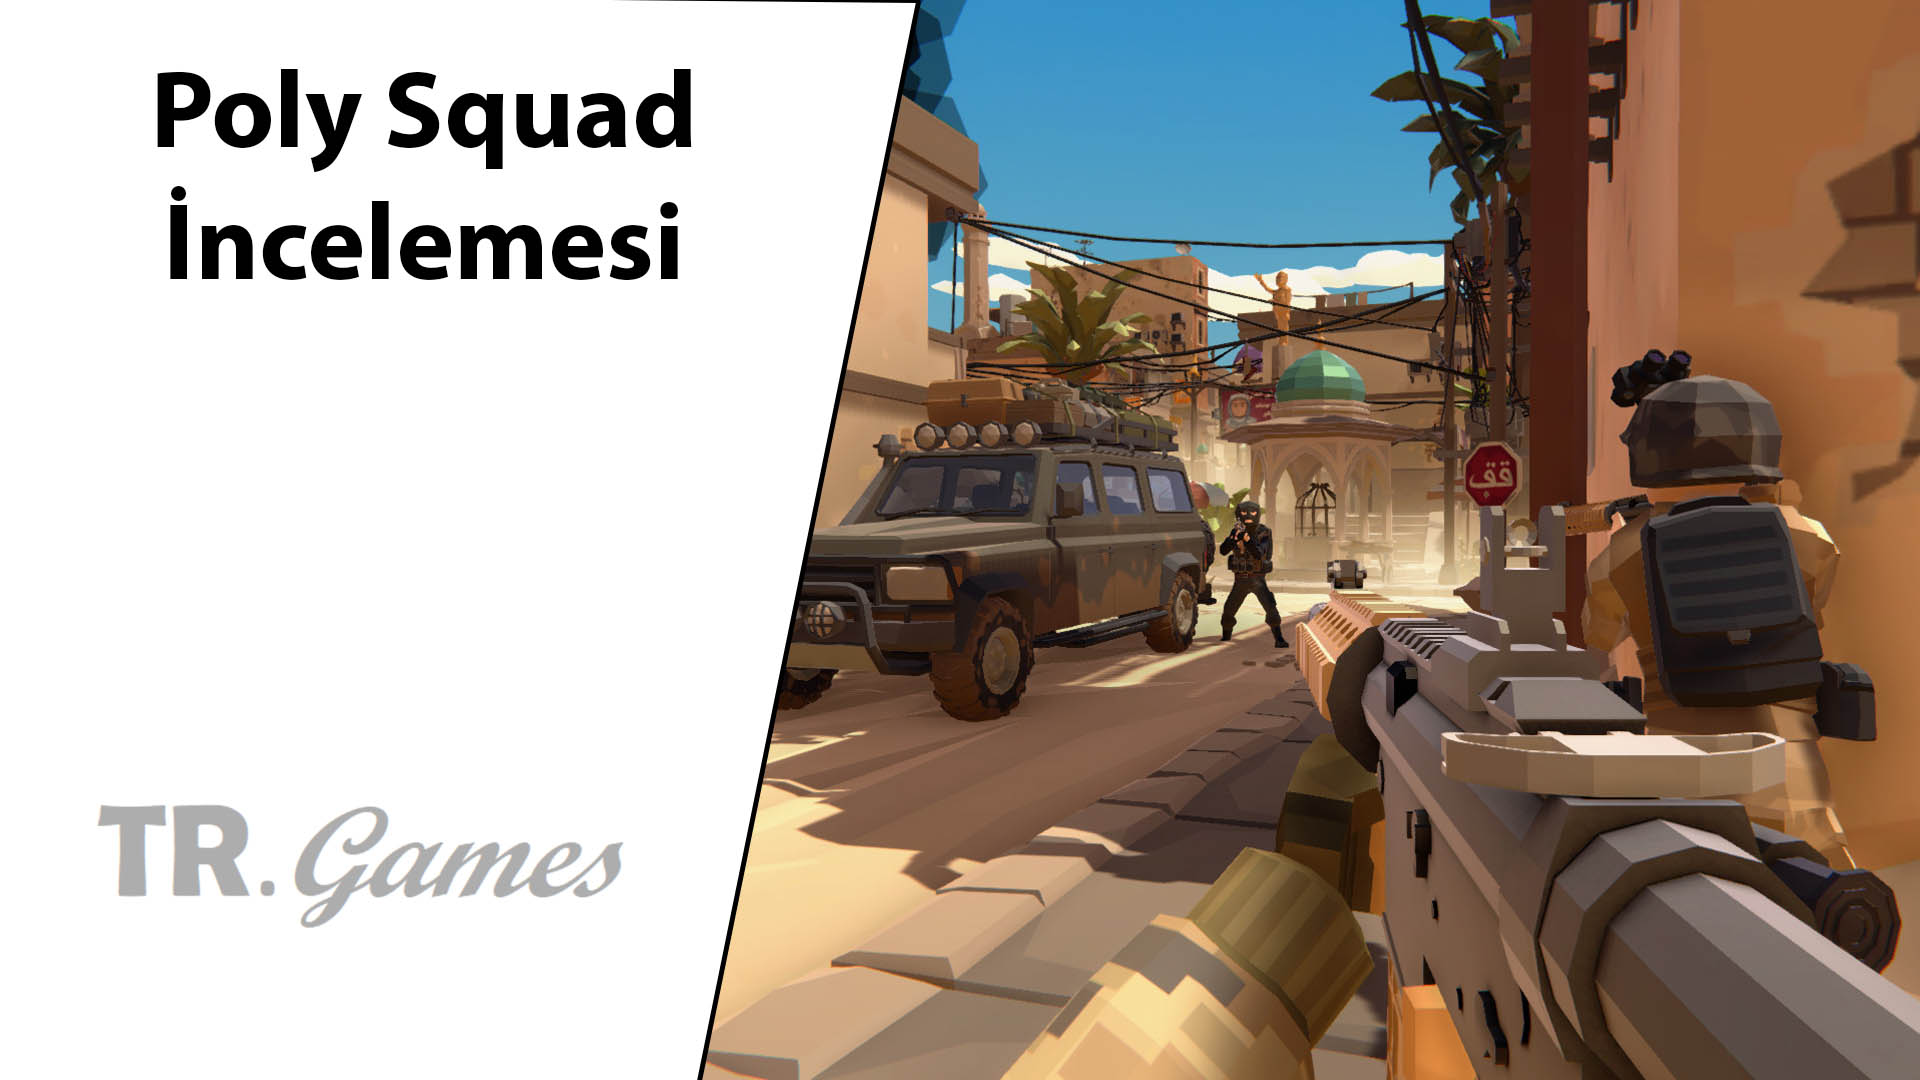 poly-squad-inceleme